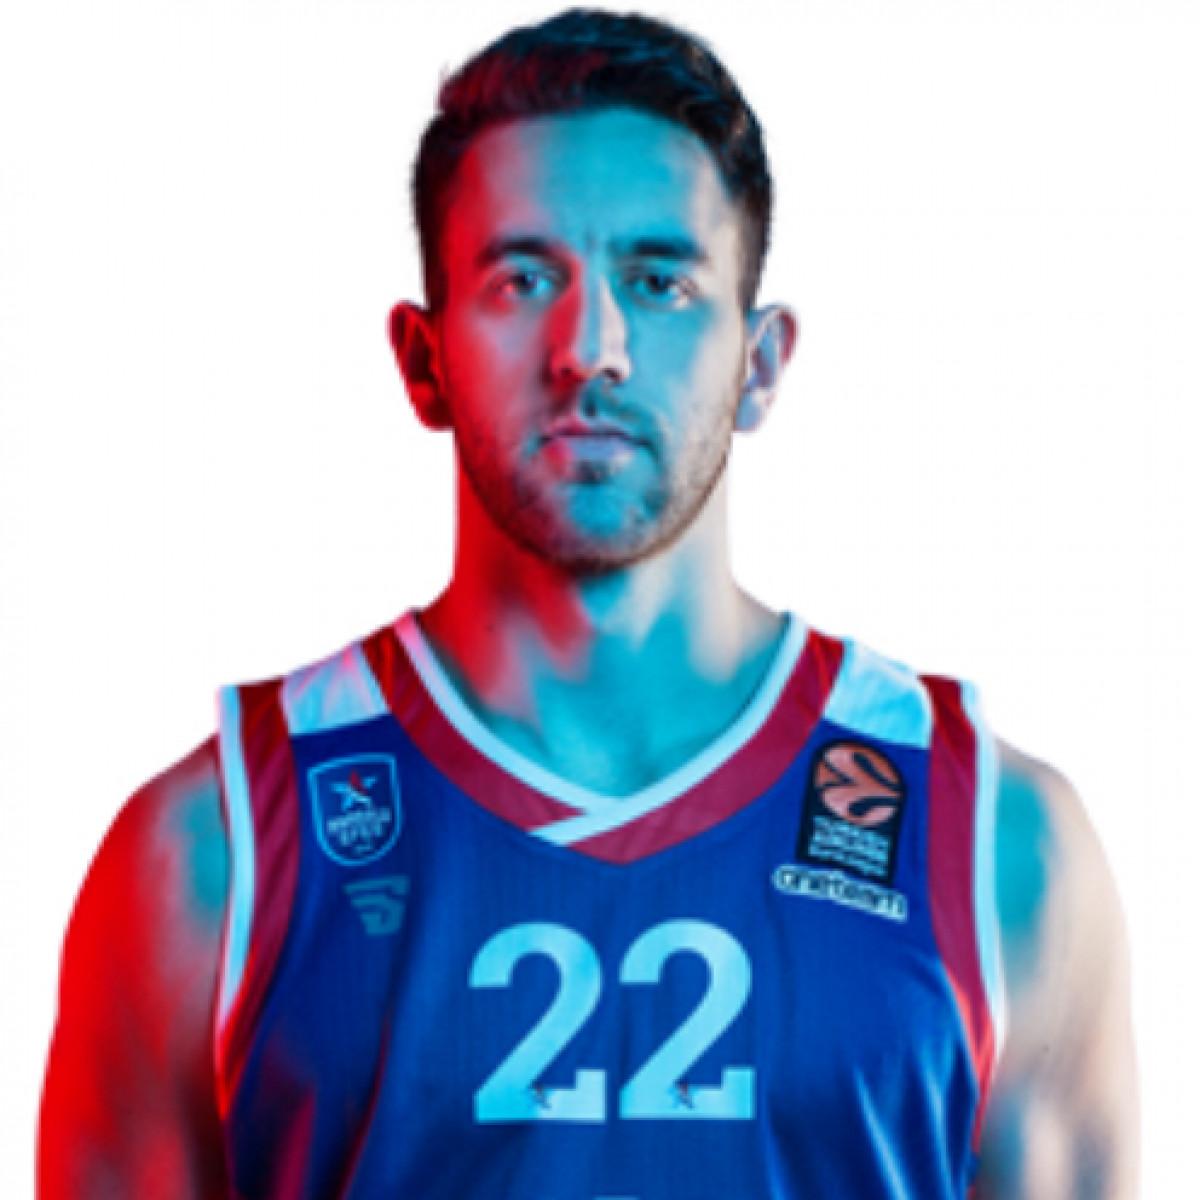 Photo of Vasilije Micic, 2018-2019 season